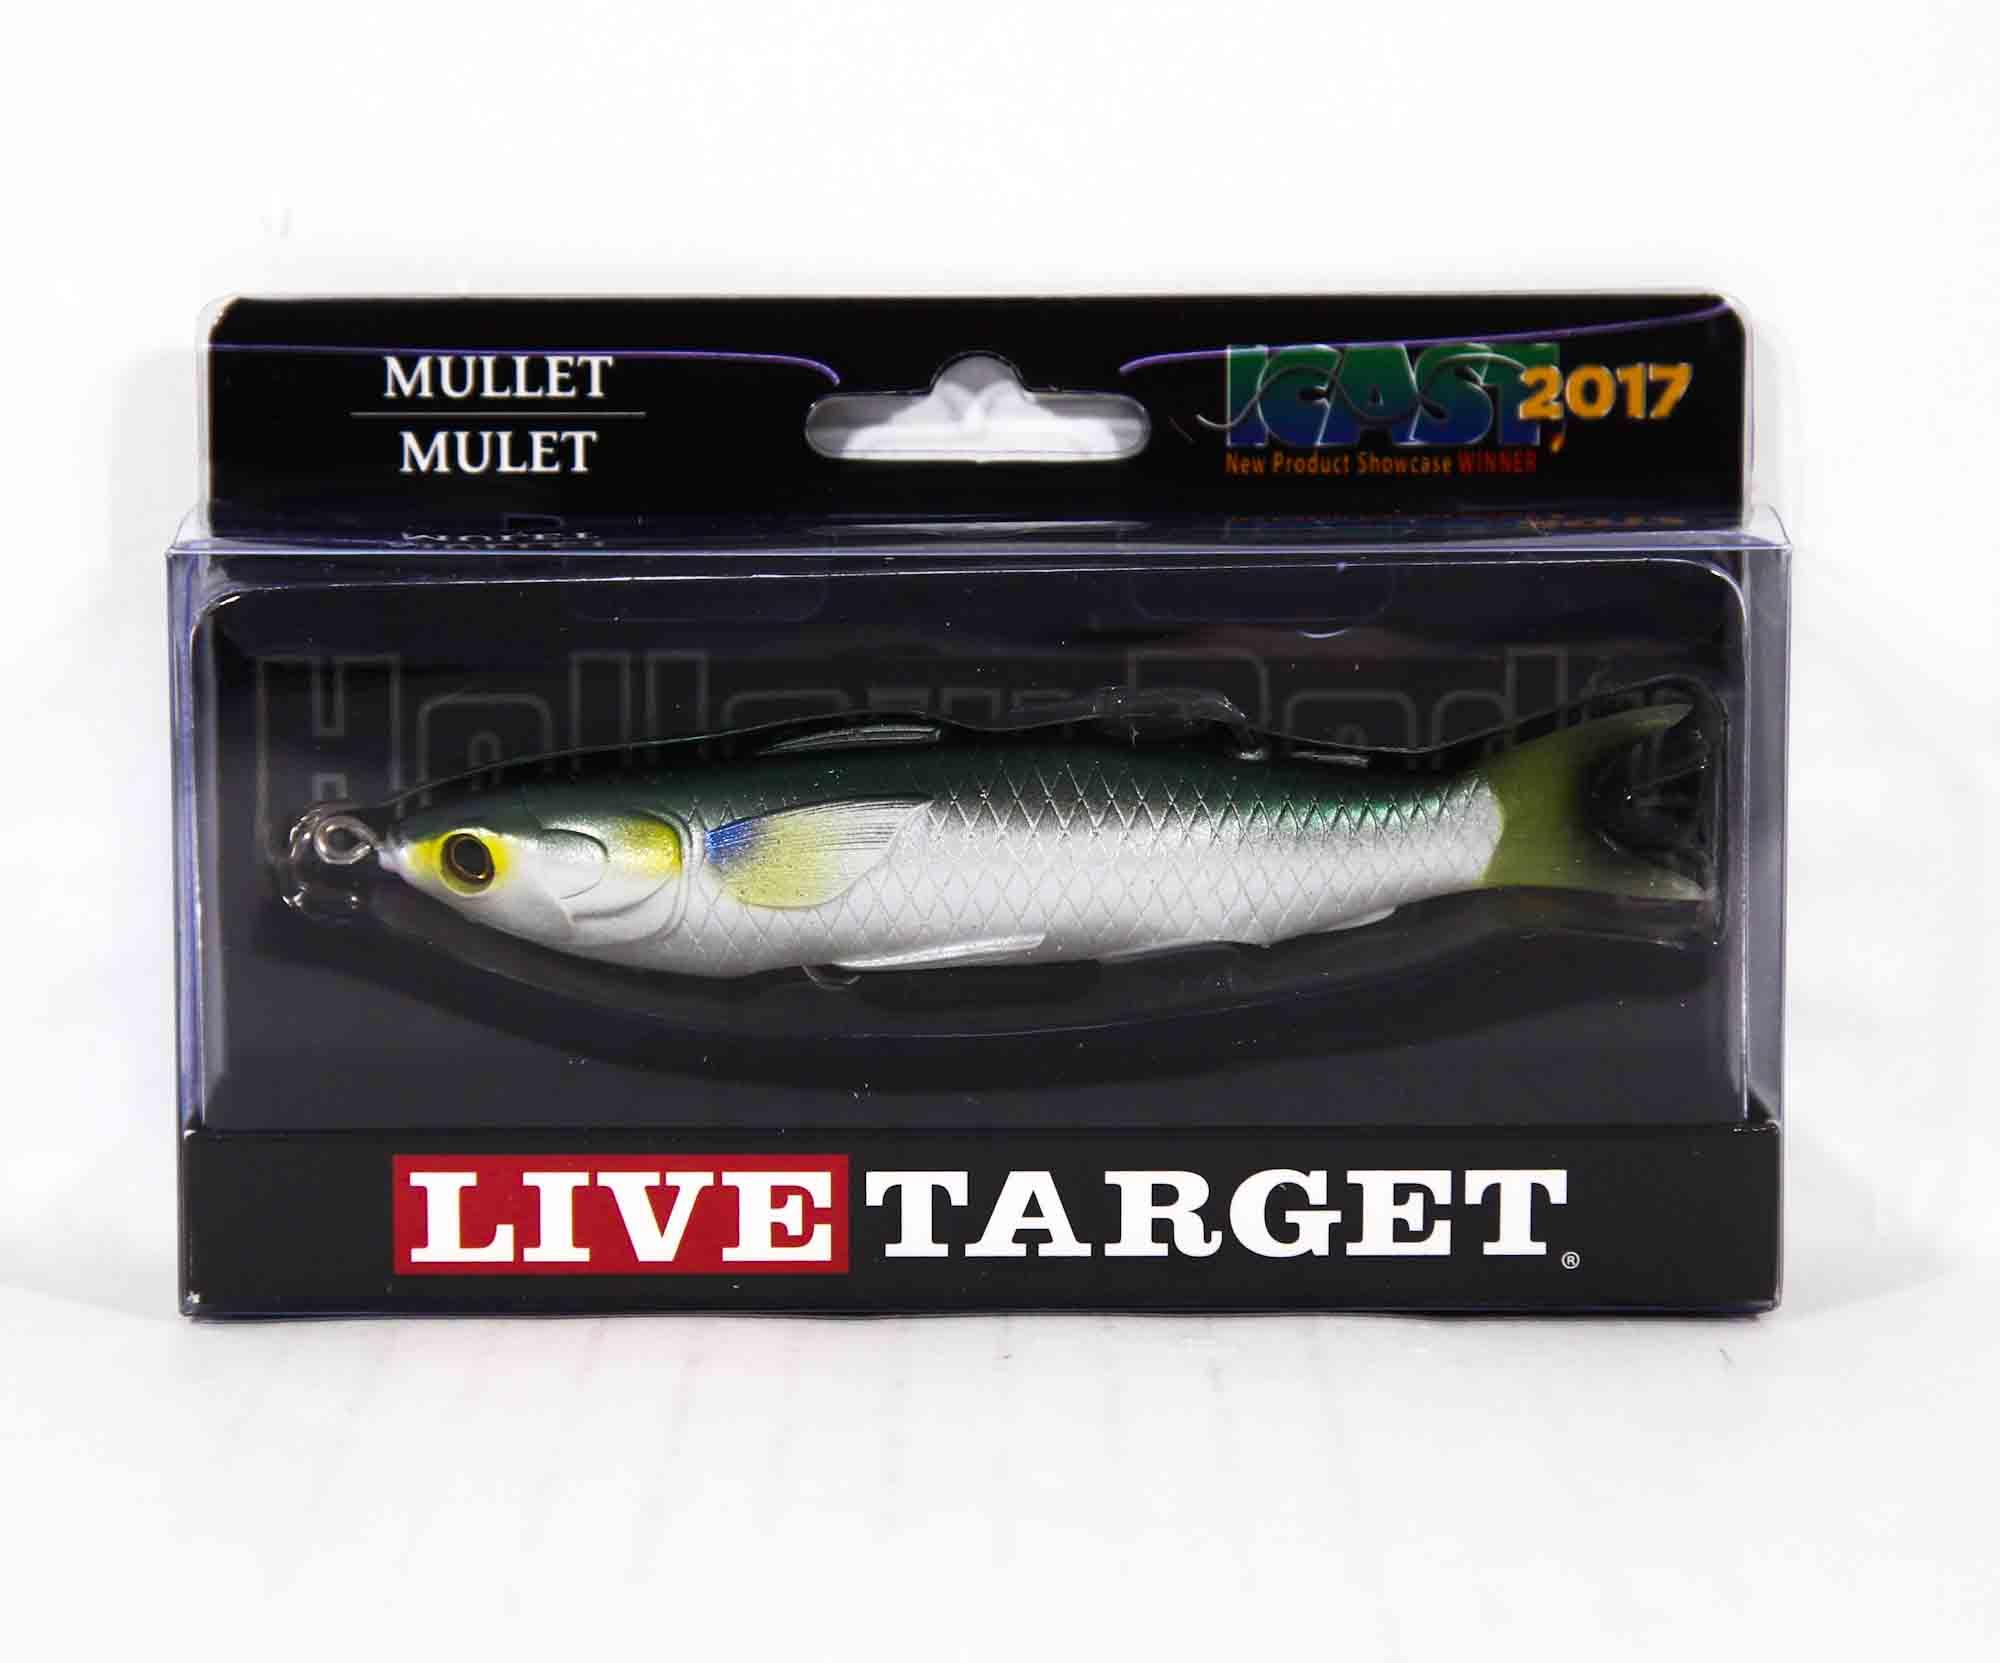 Live Target MUH115T716 Mullet Walking Bait 4.5 Inch Silver (0460)